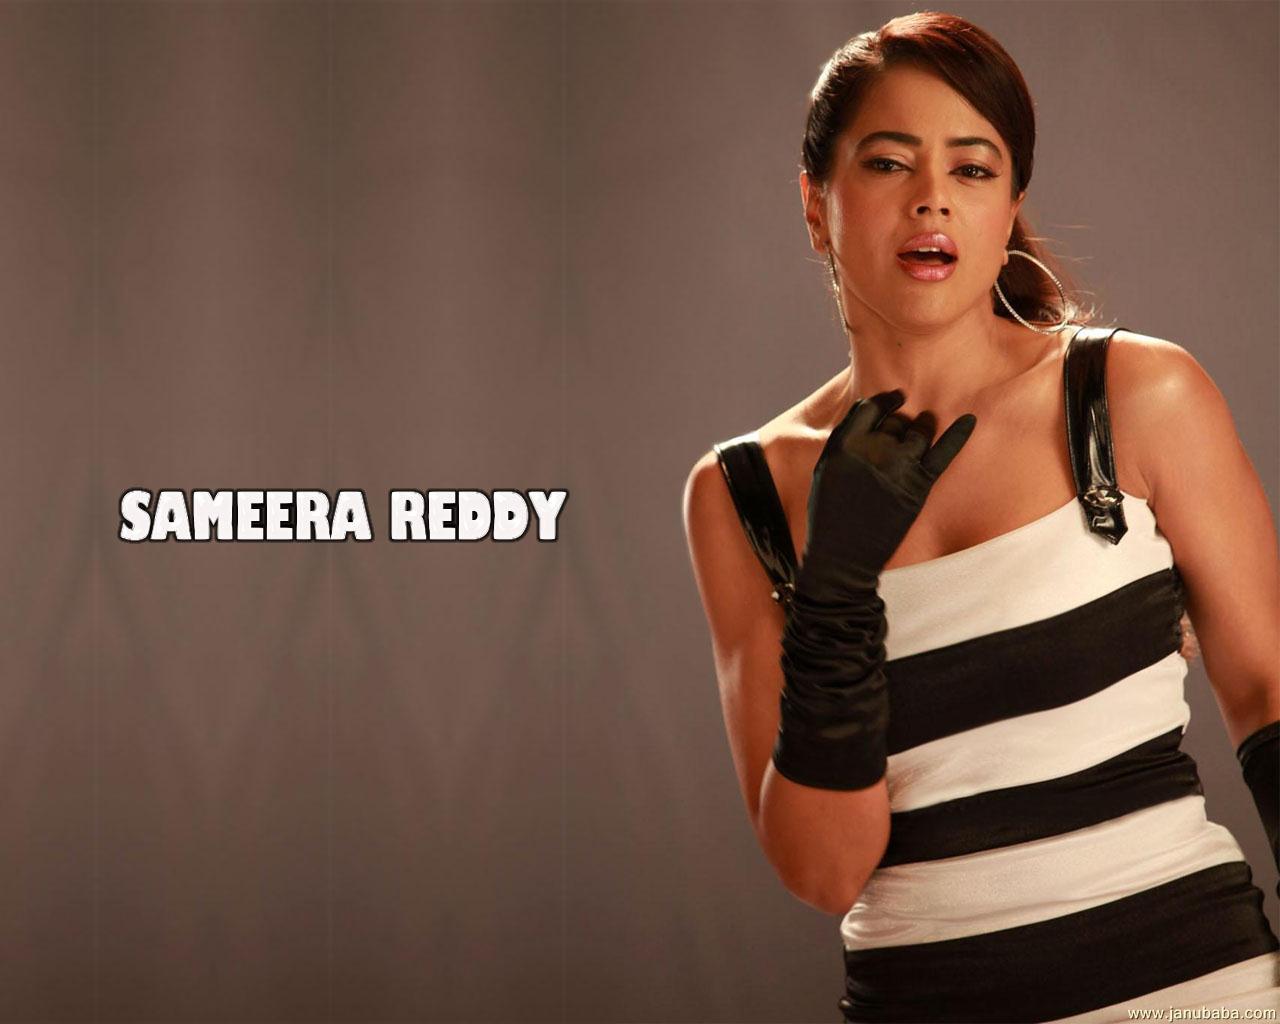 Sameera reddy sexy images